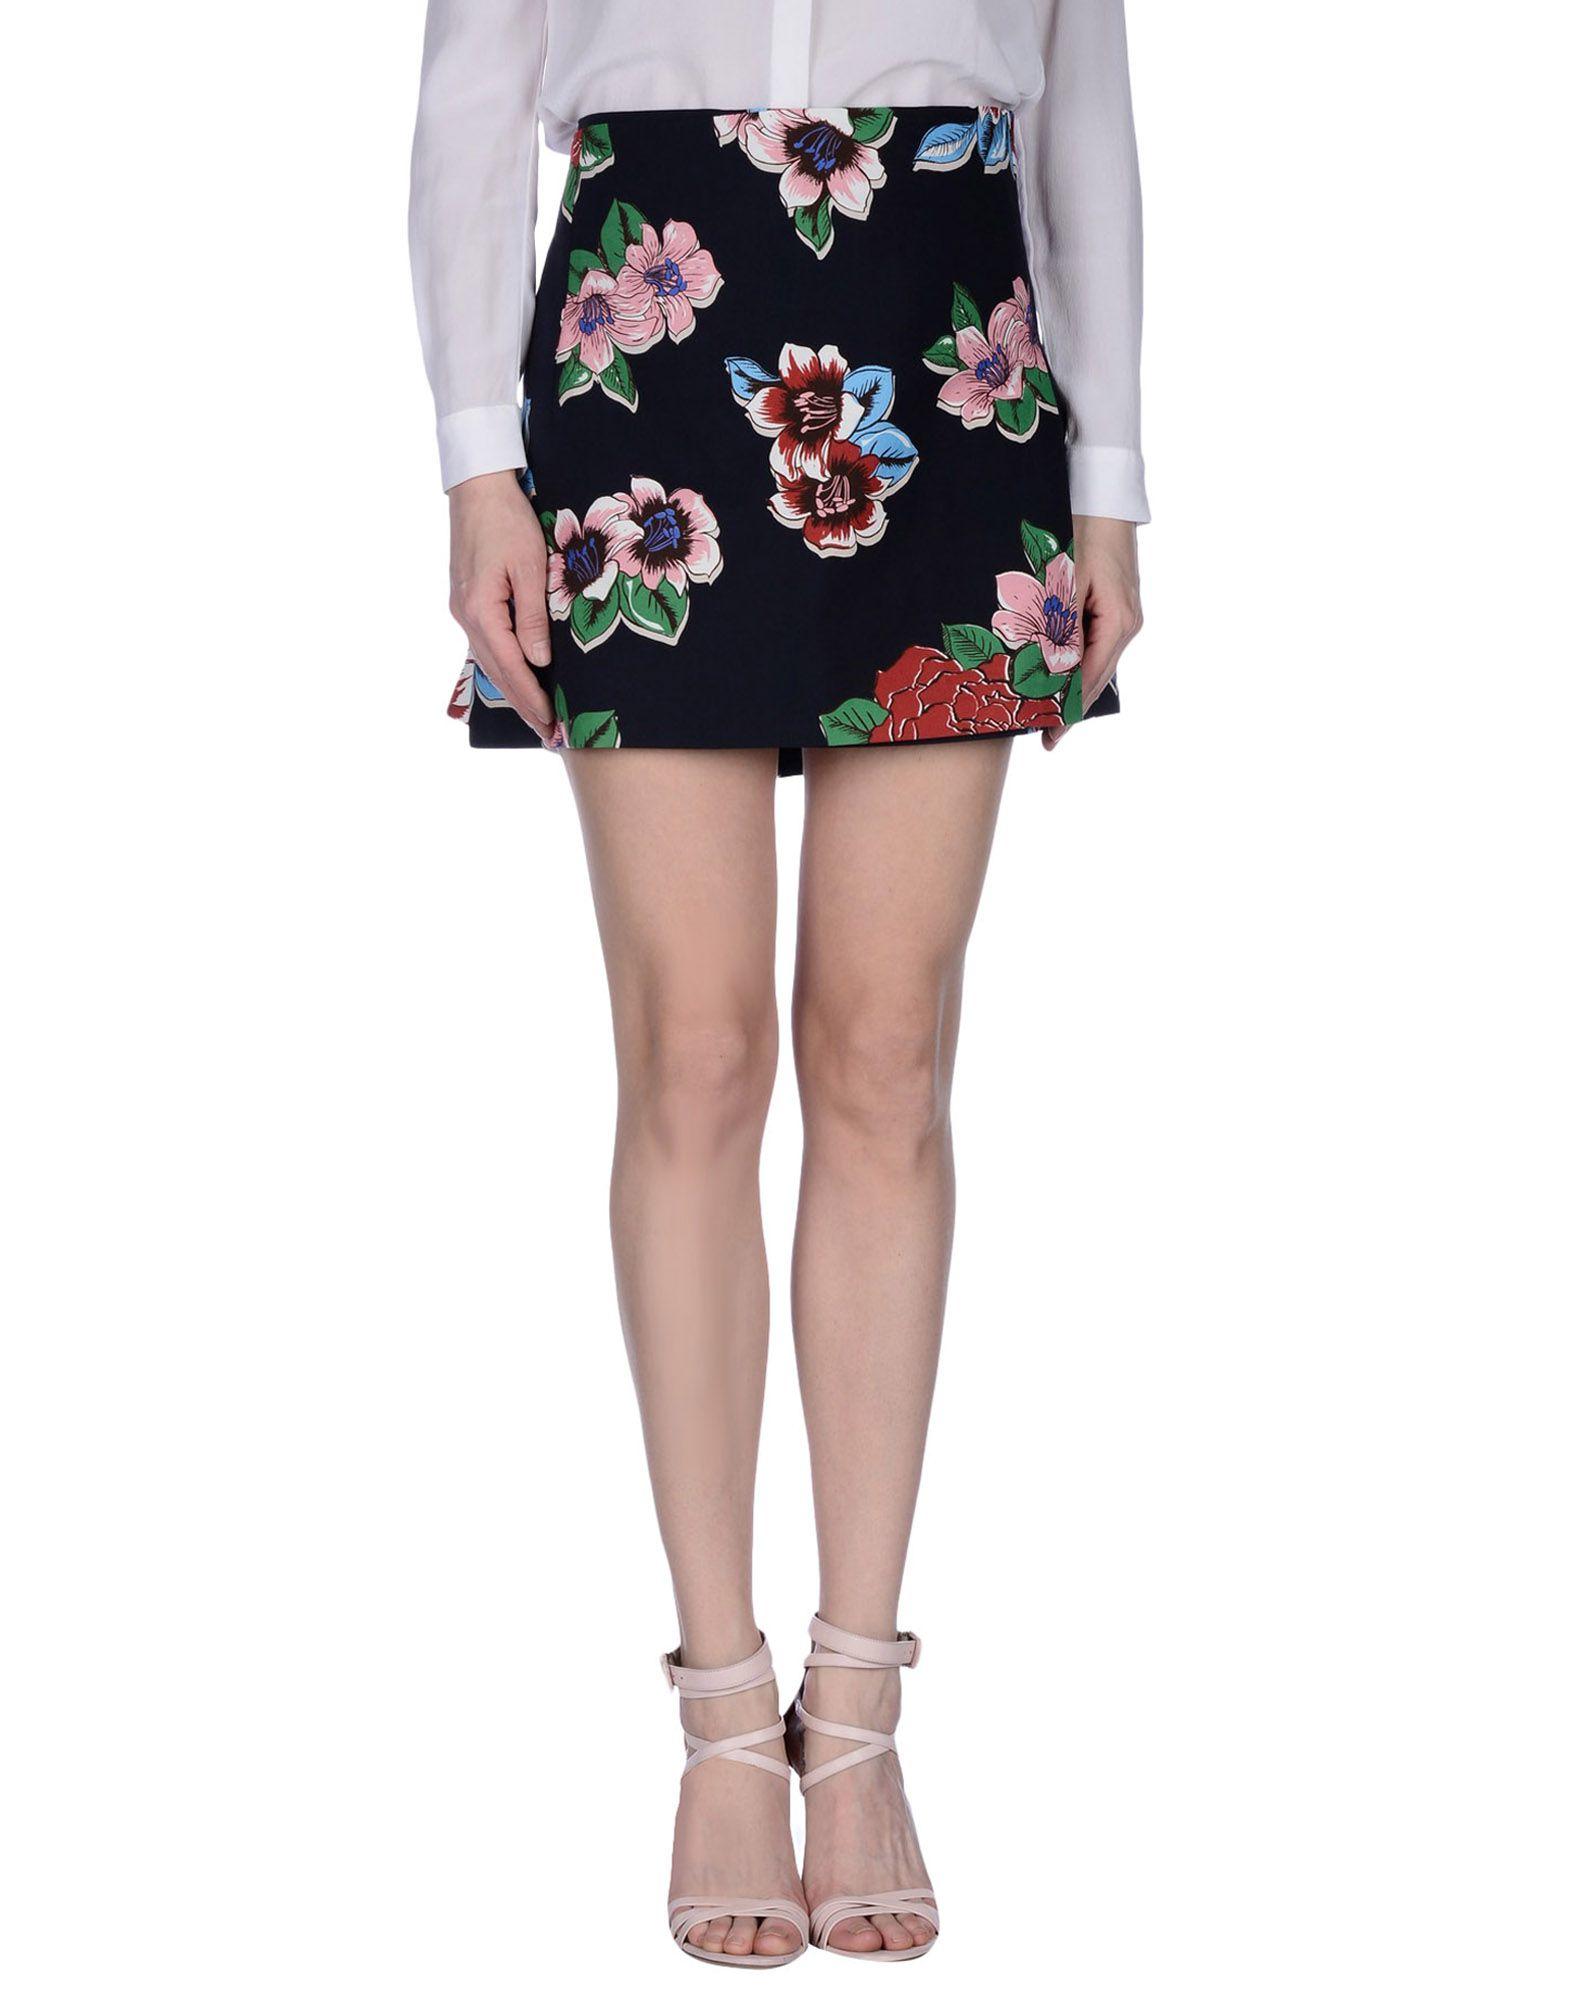 ribeiro short skirts Selma